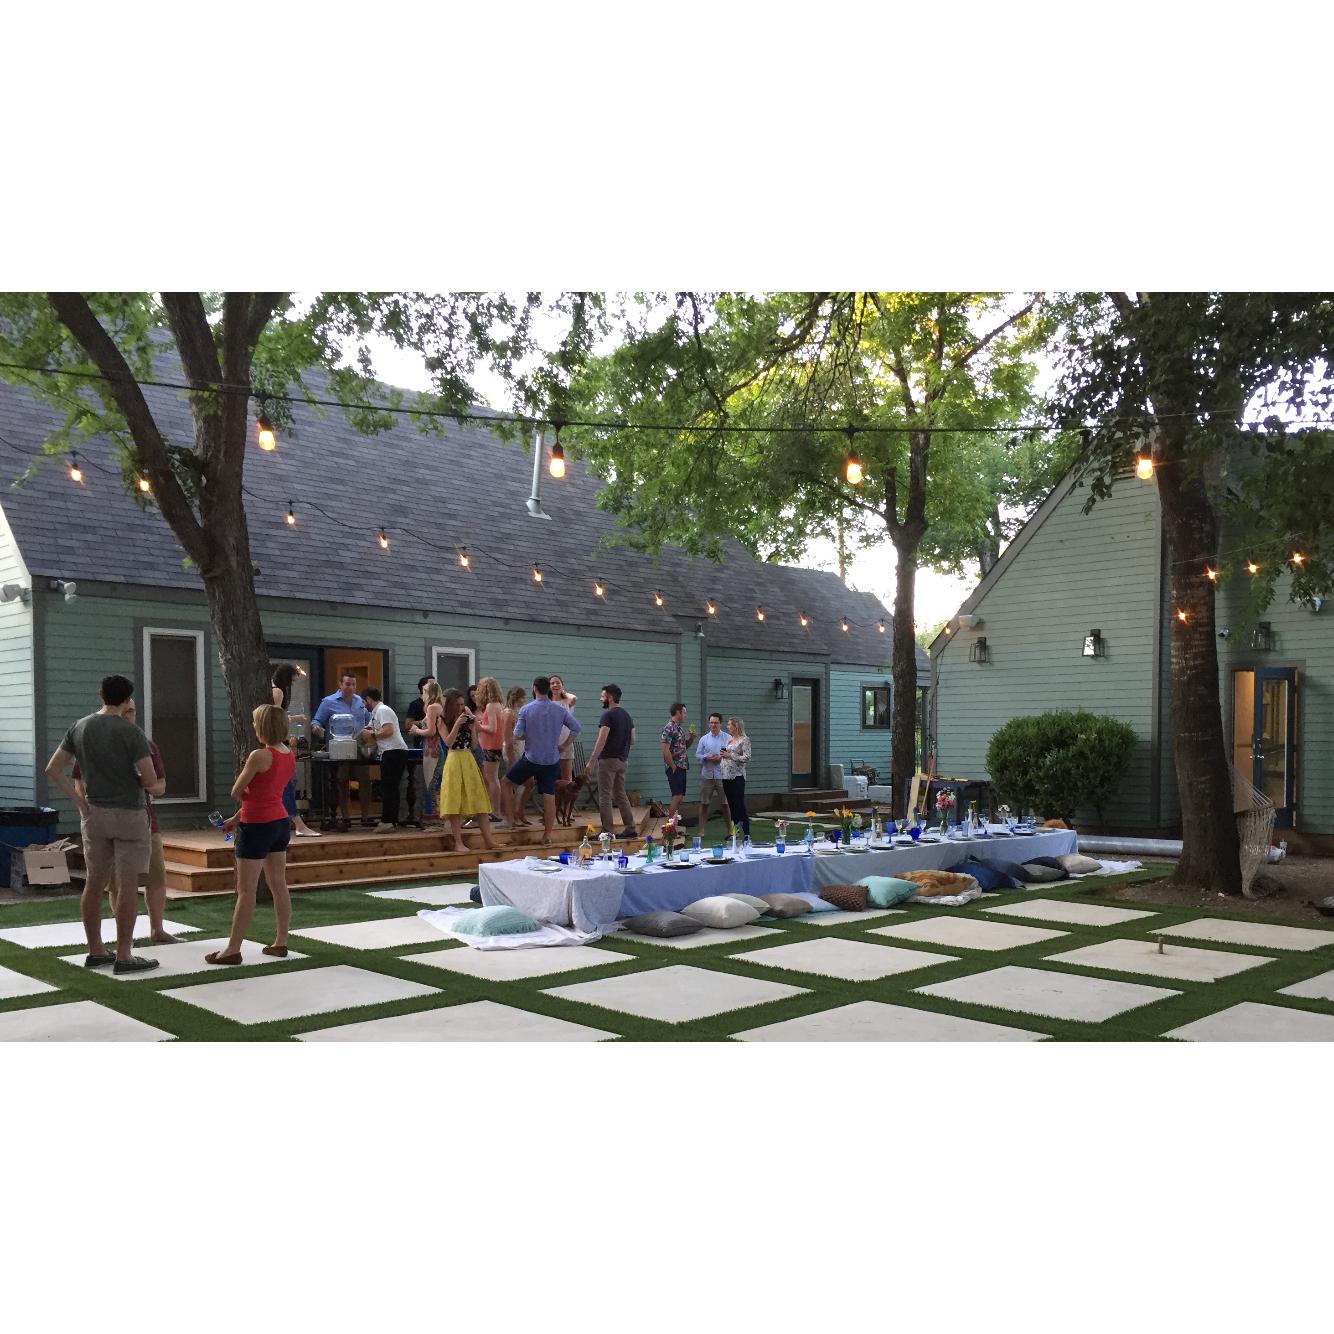 SWAY outdoor living - Austin, TX 78759 - (512)580-4225 | ShowMeLocal.com